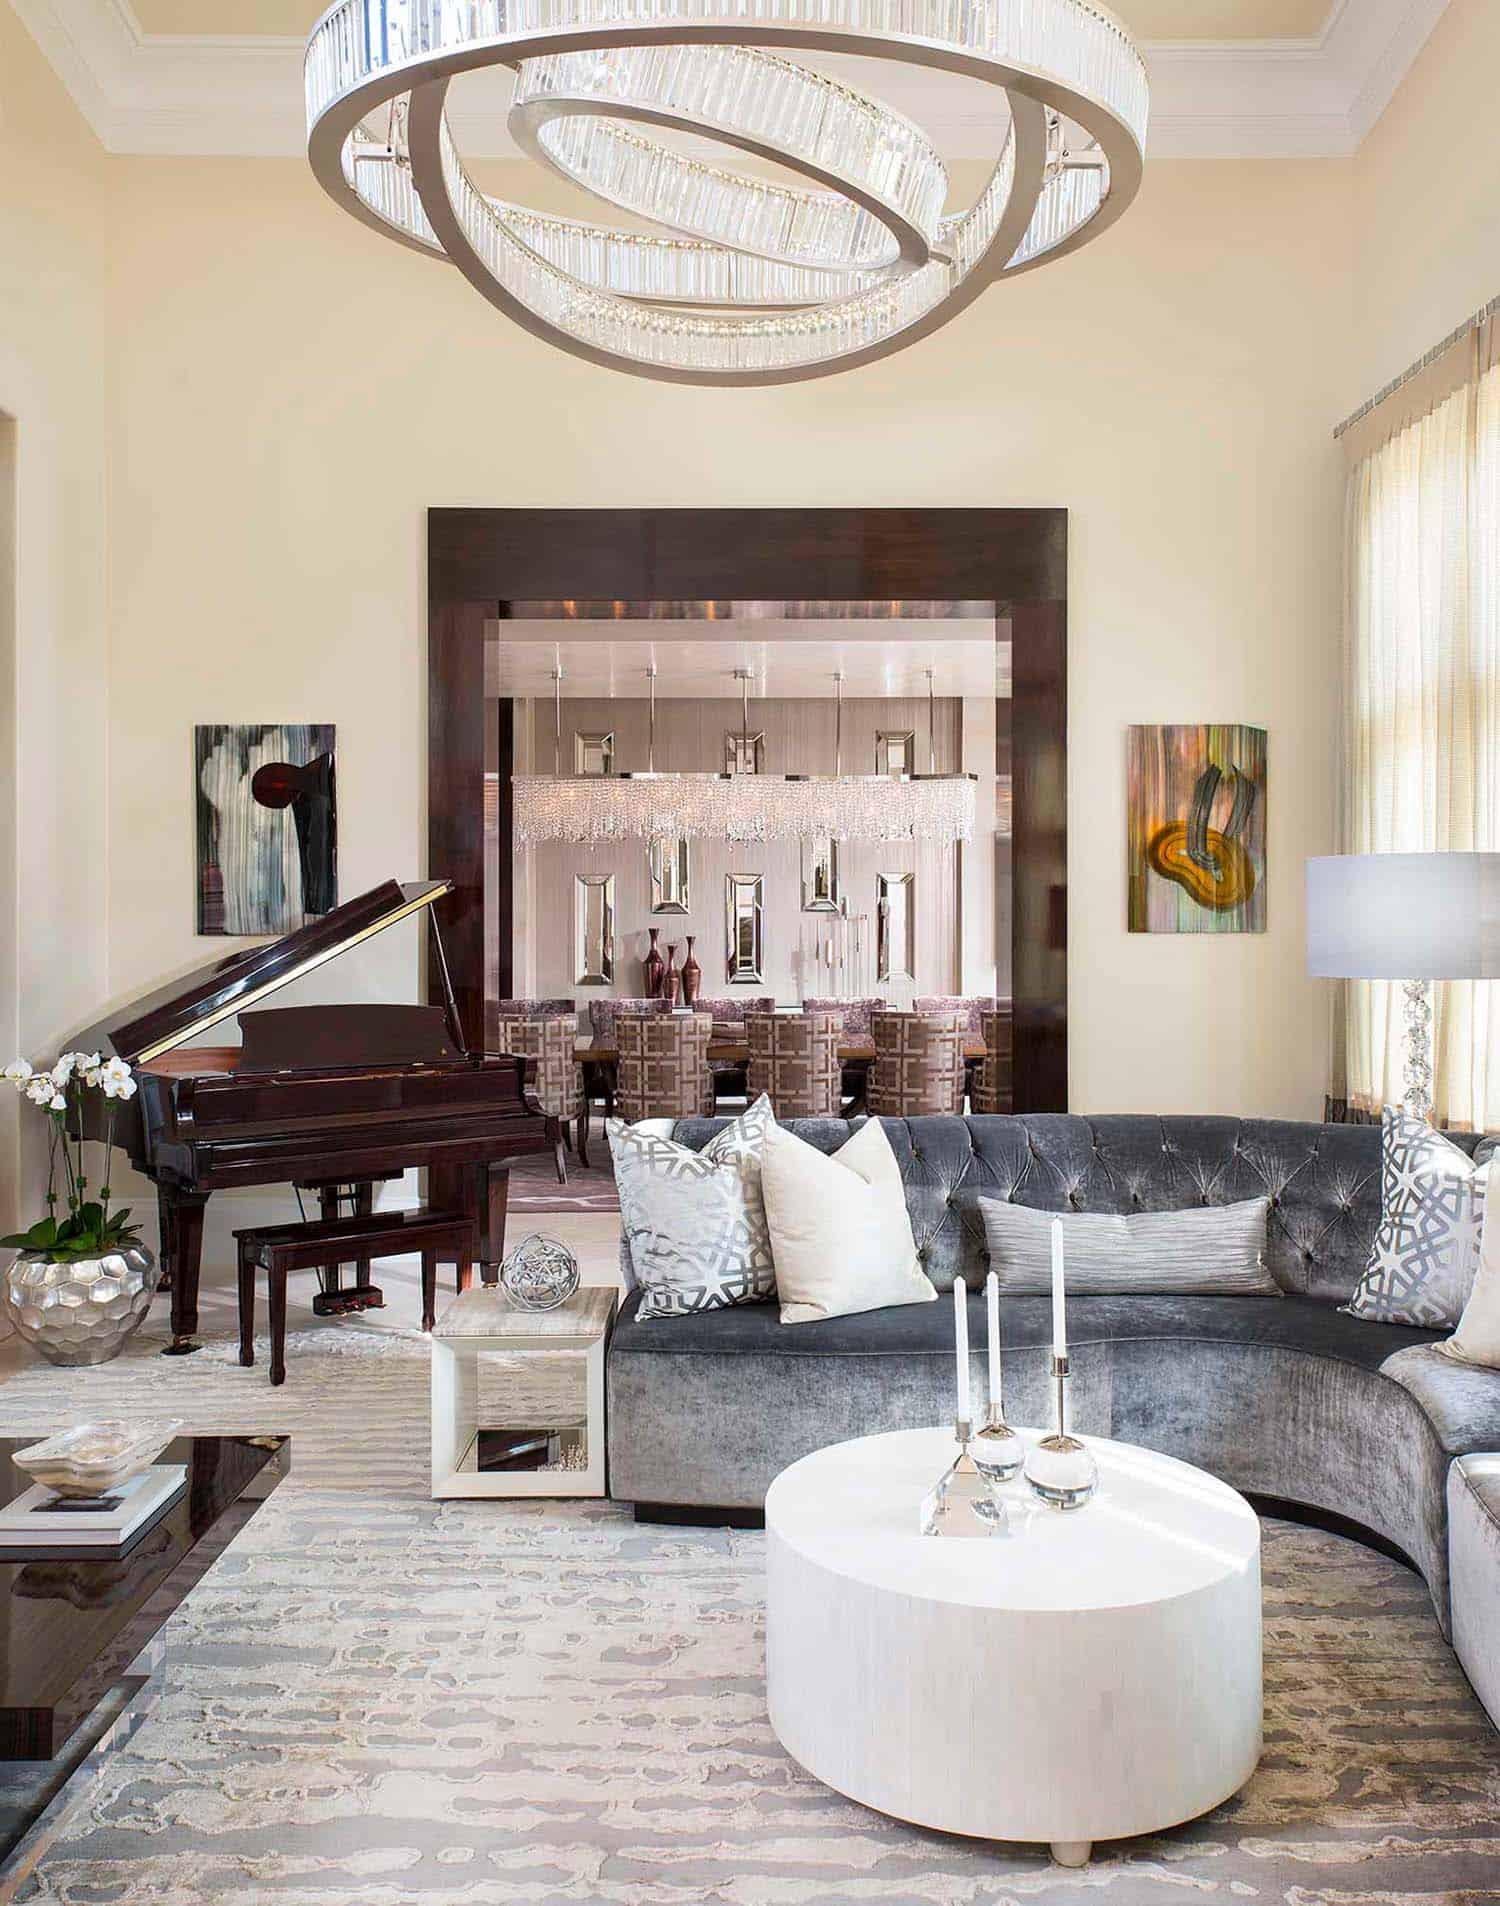 Contemporary Style Home-Dallas Design Group-04-1 Kindesign